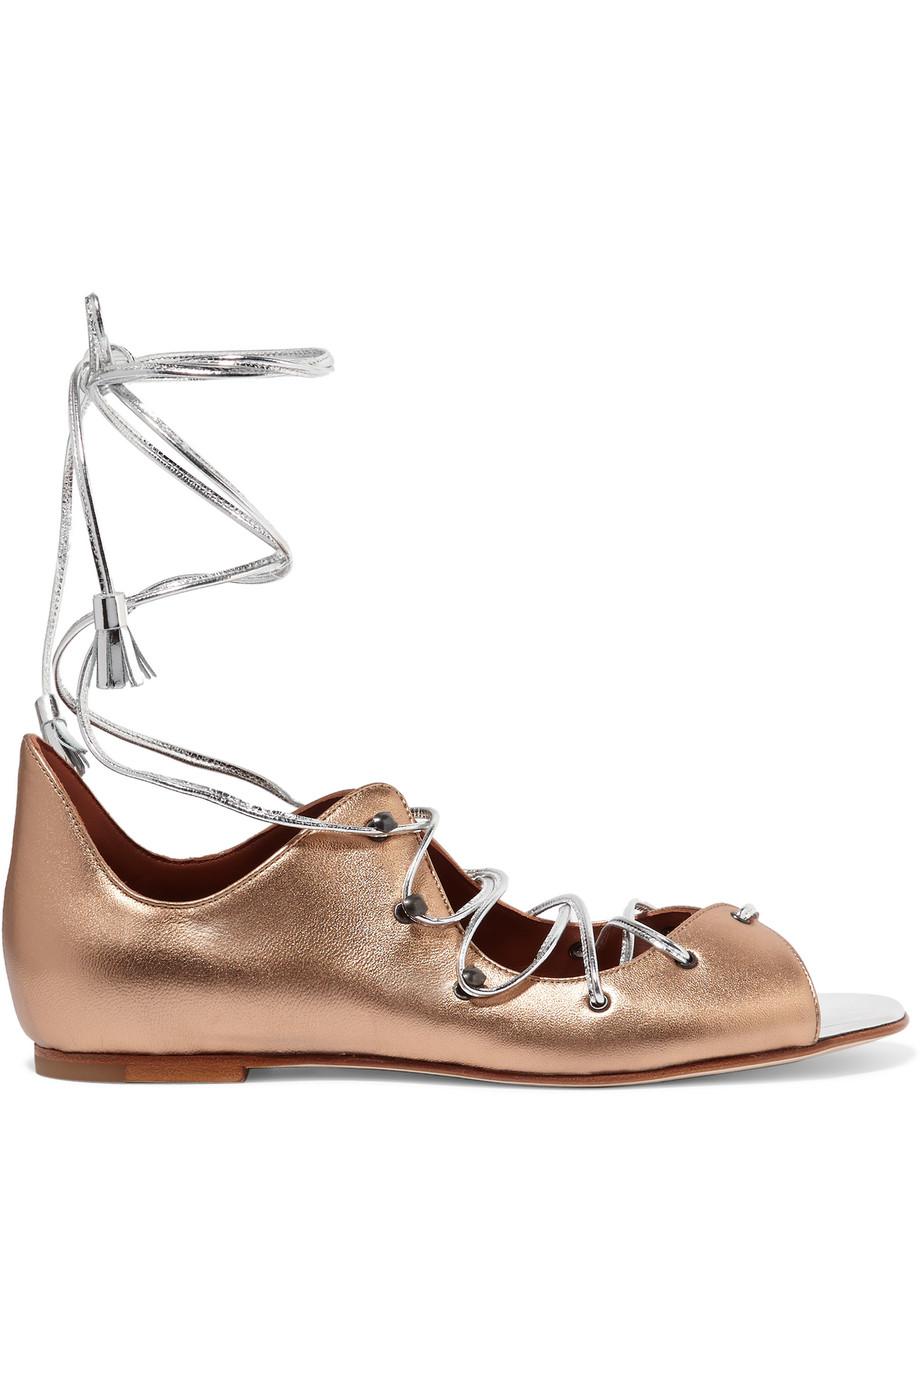 Savannah Lace-Up Metallic Leather Sandals, Gold/Metallic, Women's US Size: 11, Size: 41.5